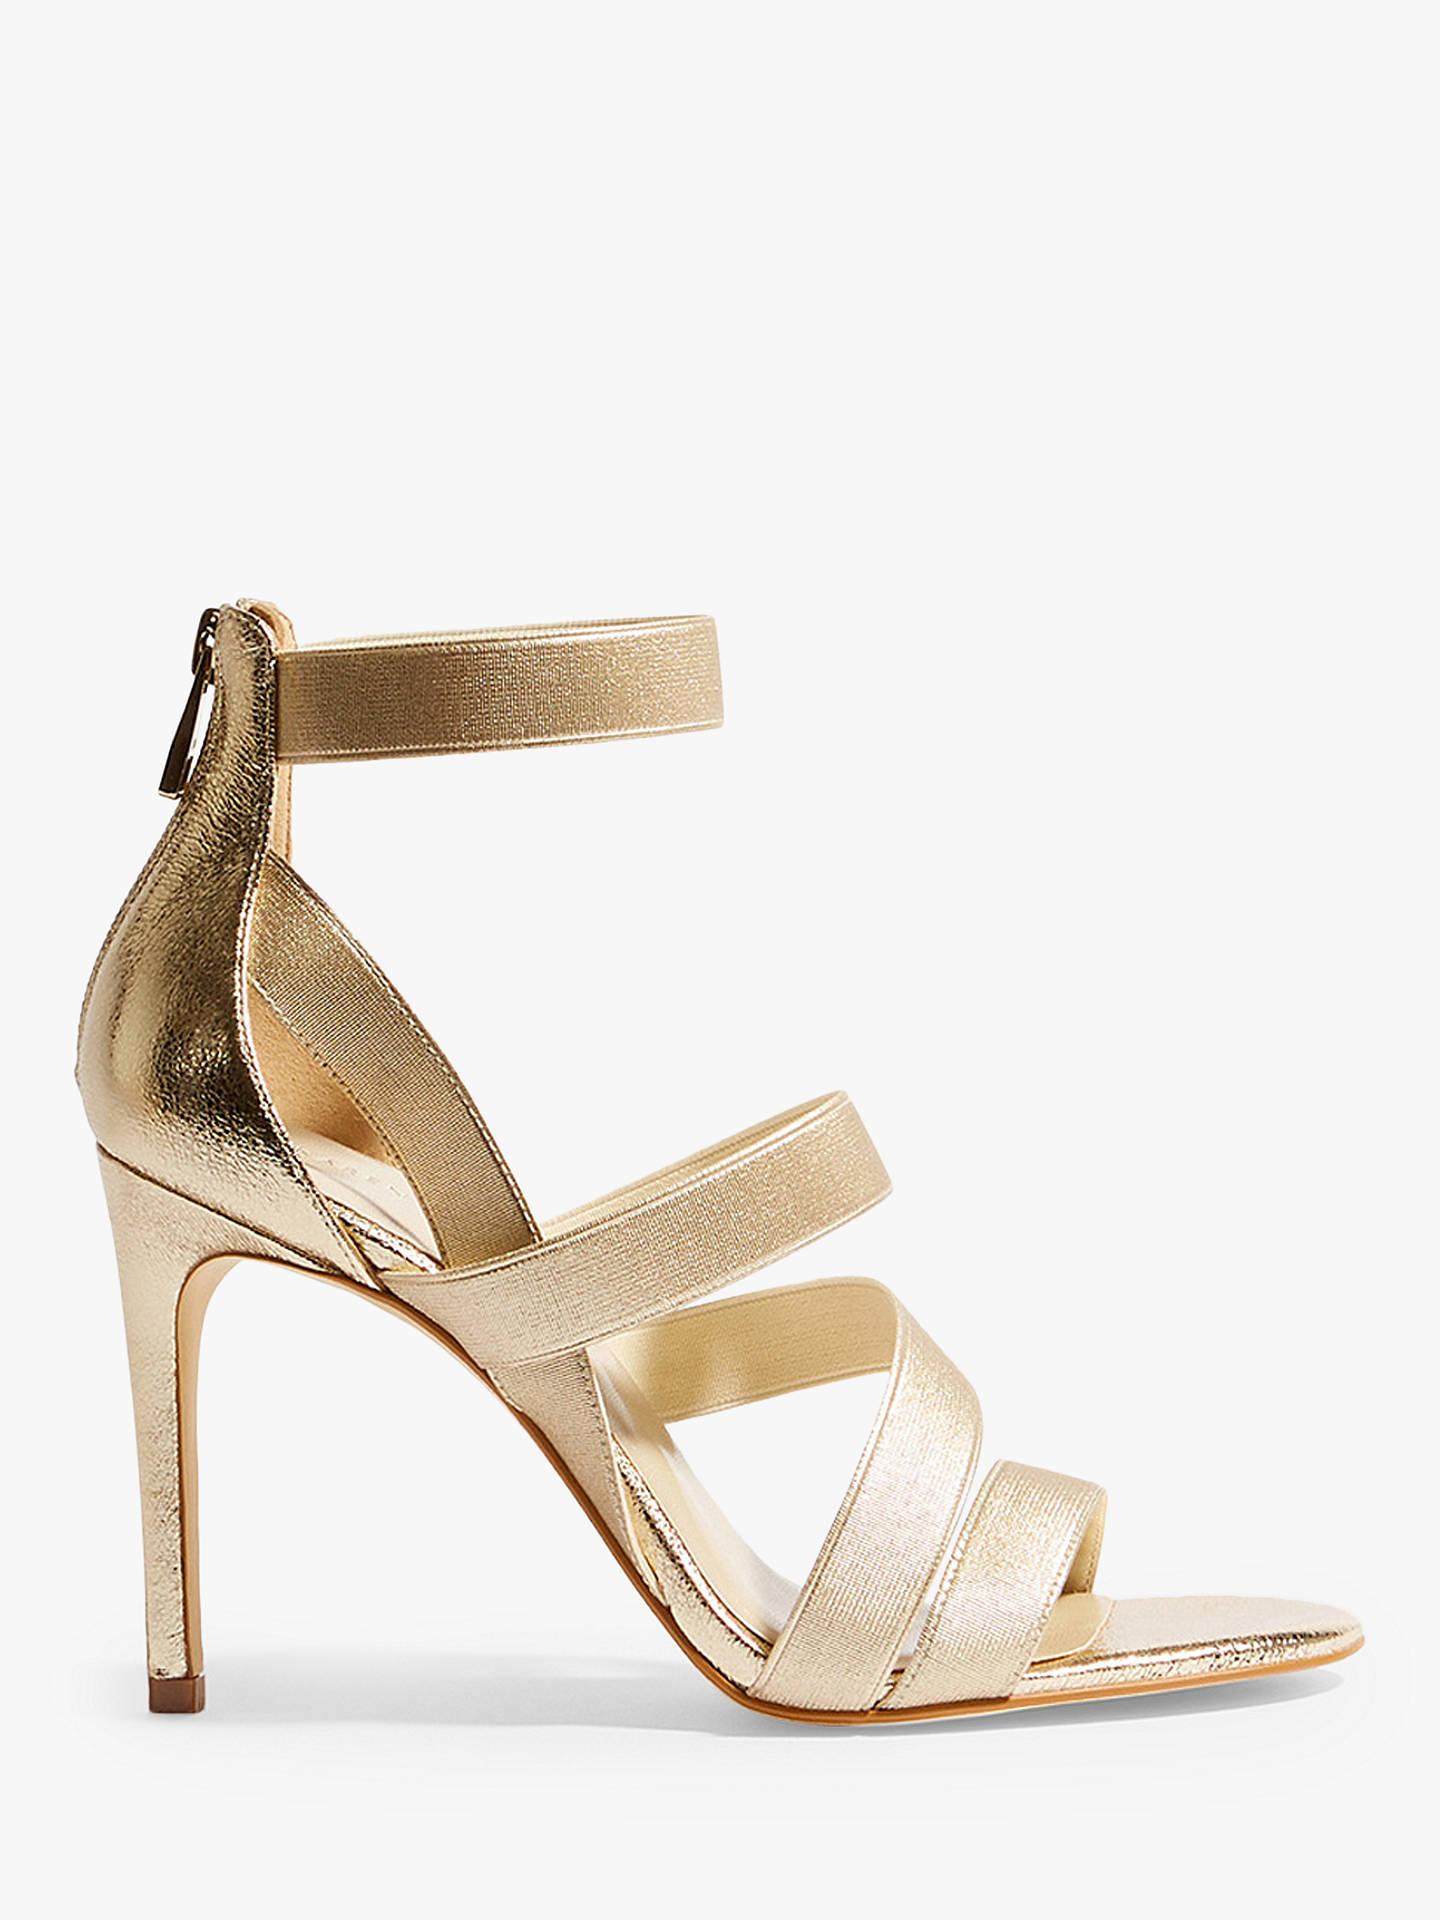 fc6e8c1e33 Buy Karen Millen Glitter Metallic Strap Sandals, Gold, 7 Online at  johnlewis.com ...